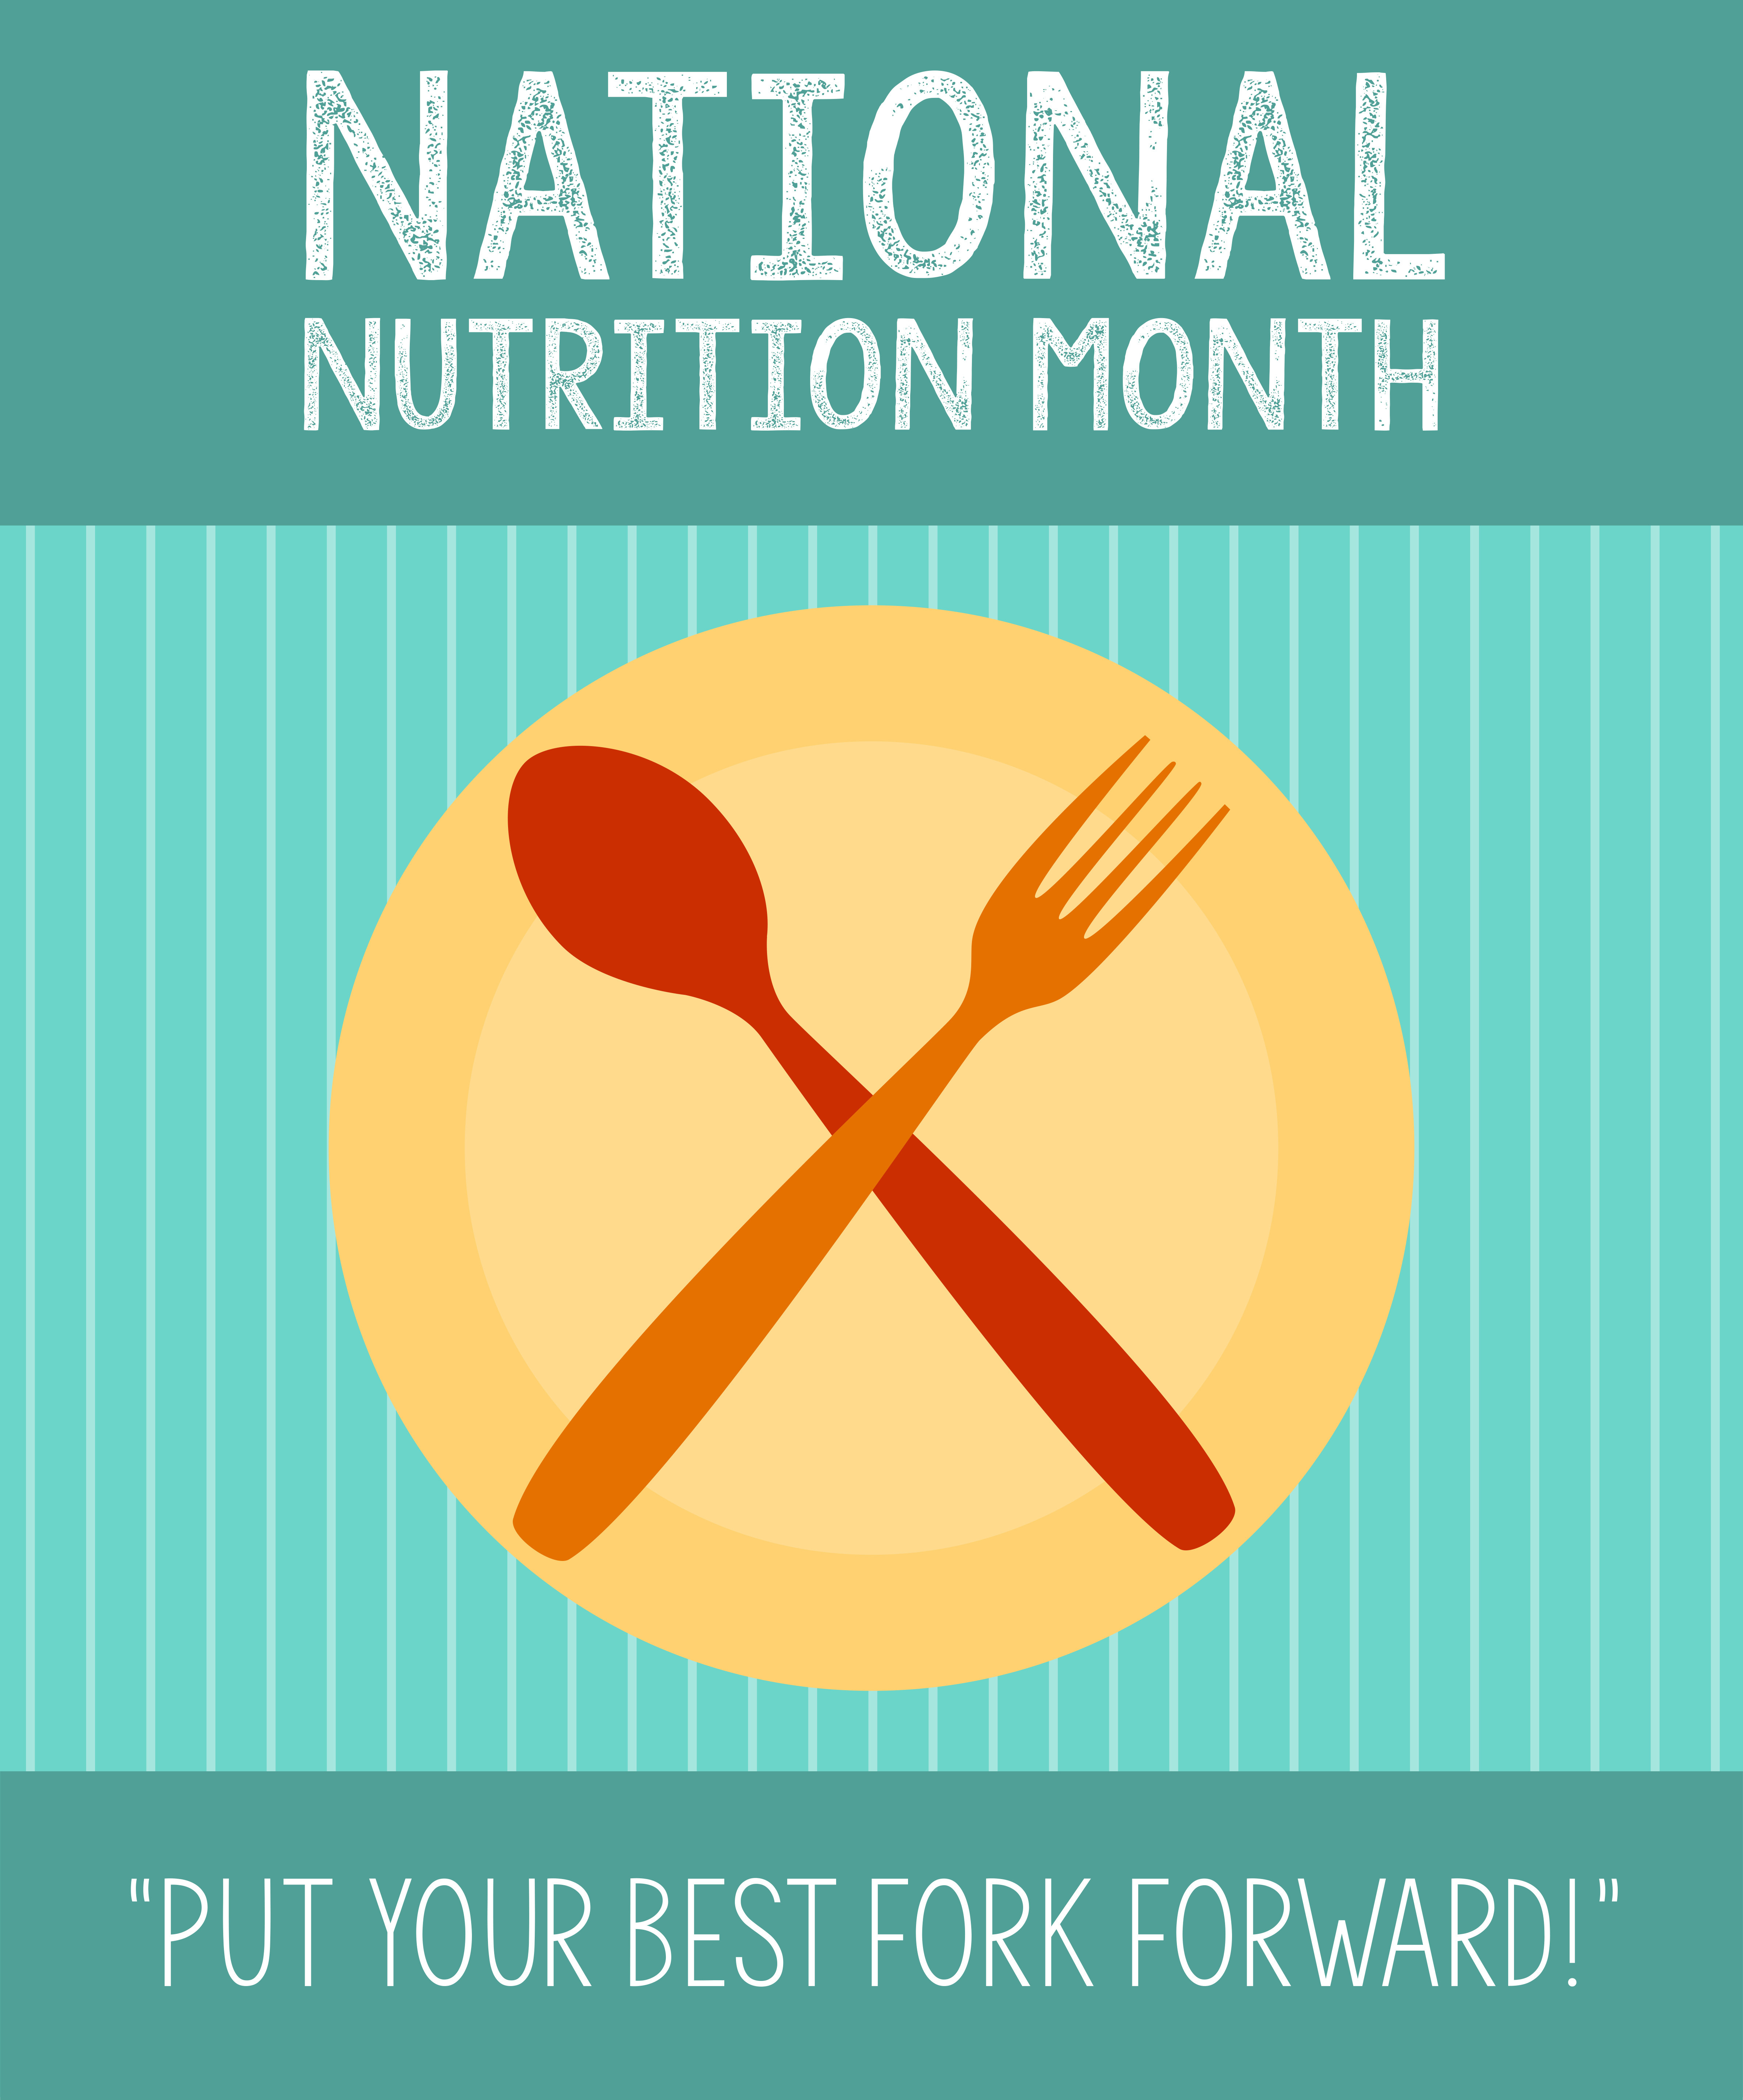 PHOTO DETAILS DOWNLOAD HI RES 1 Of National Nutrition Month